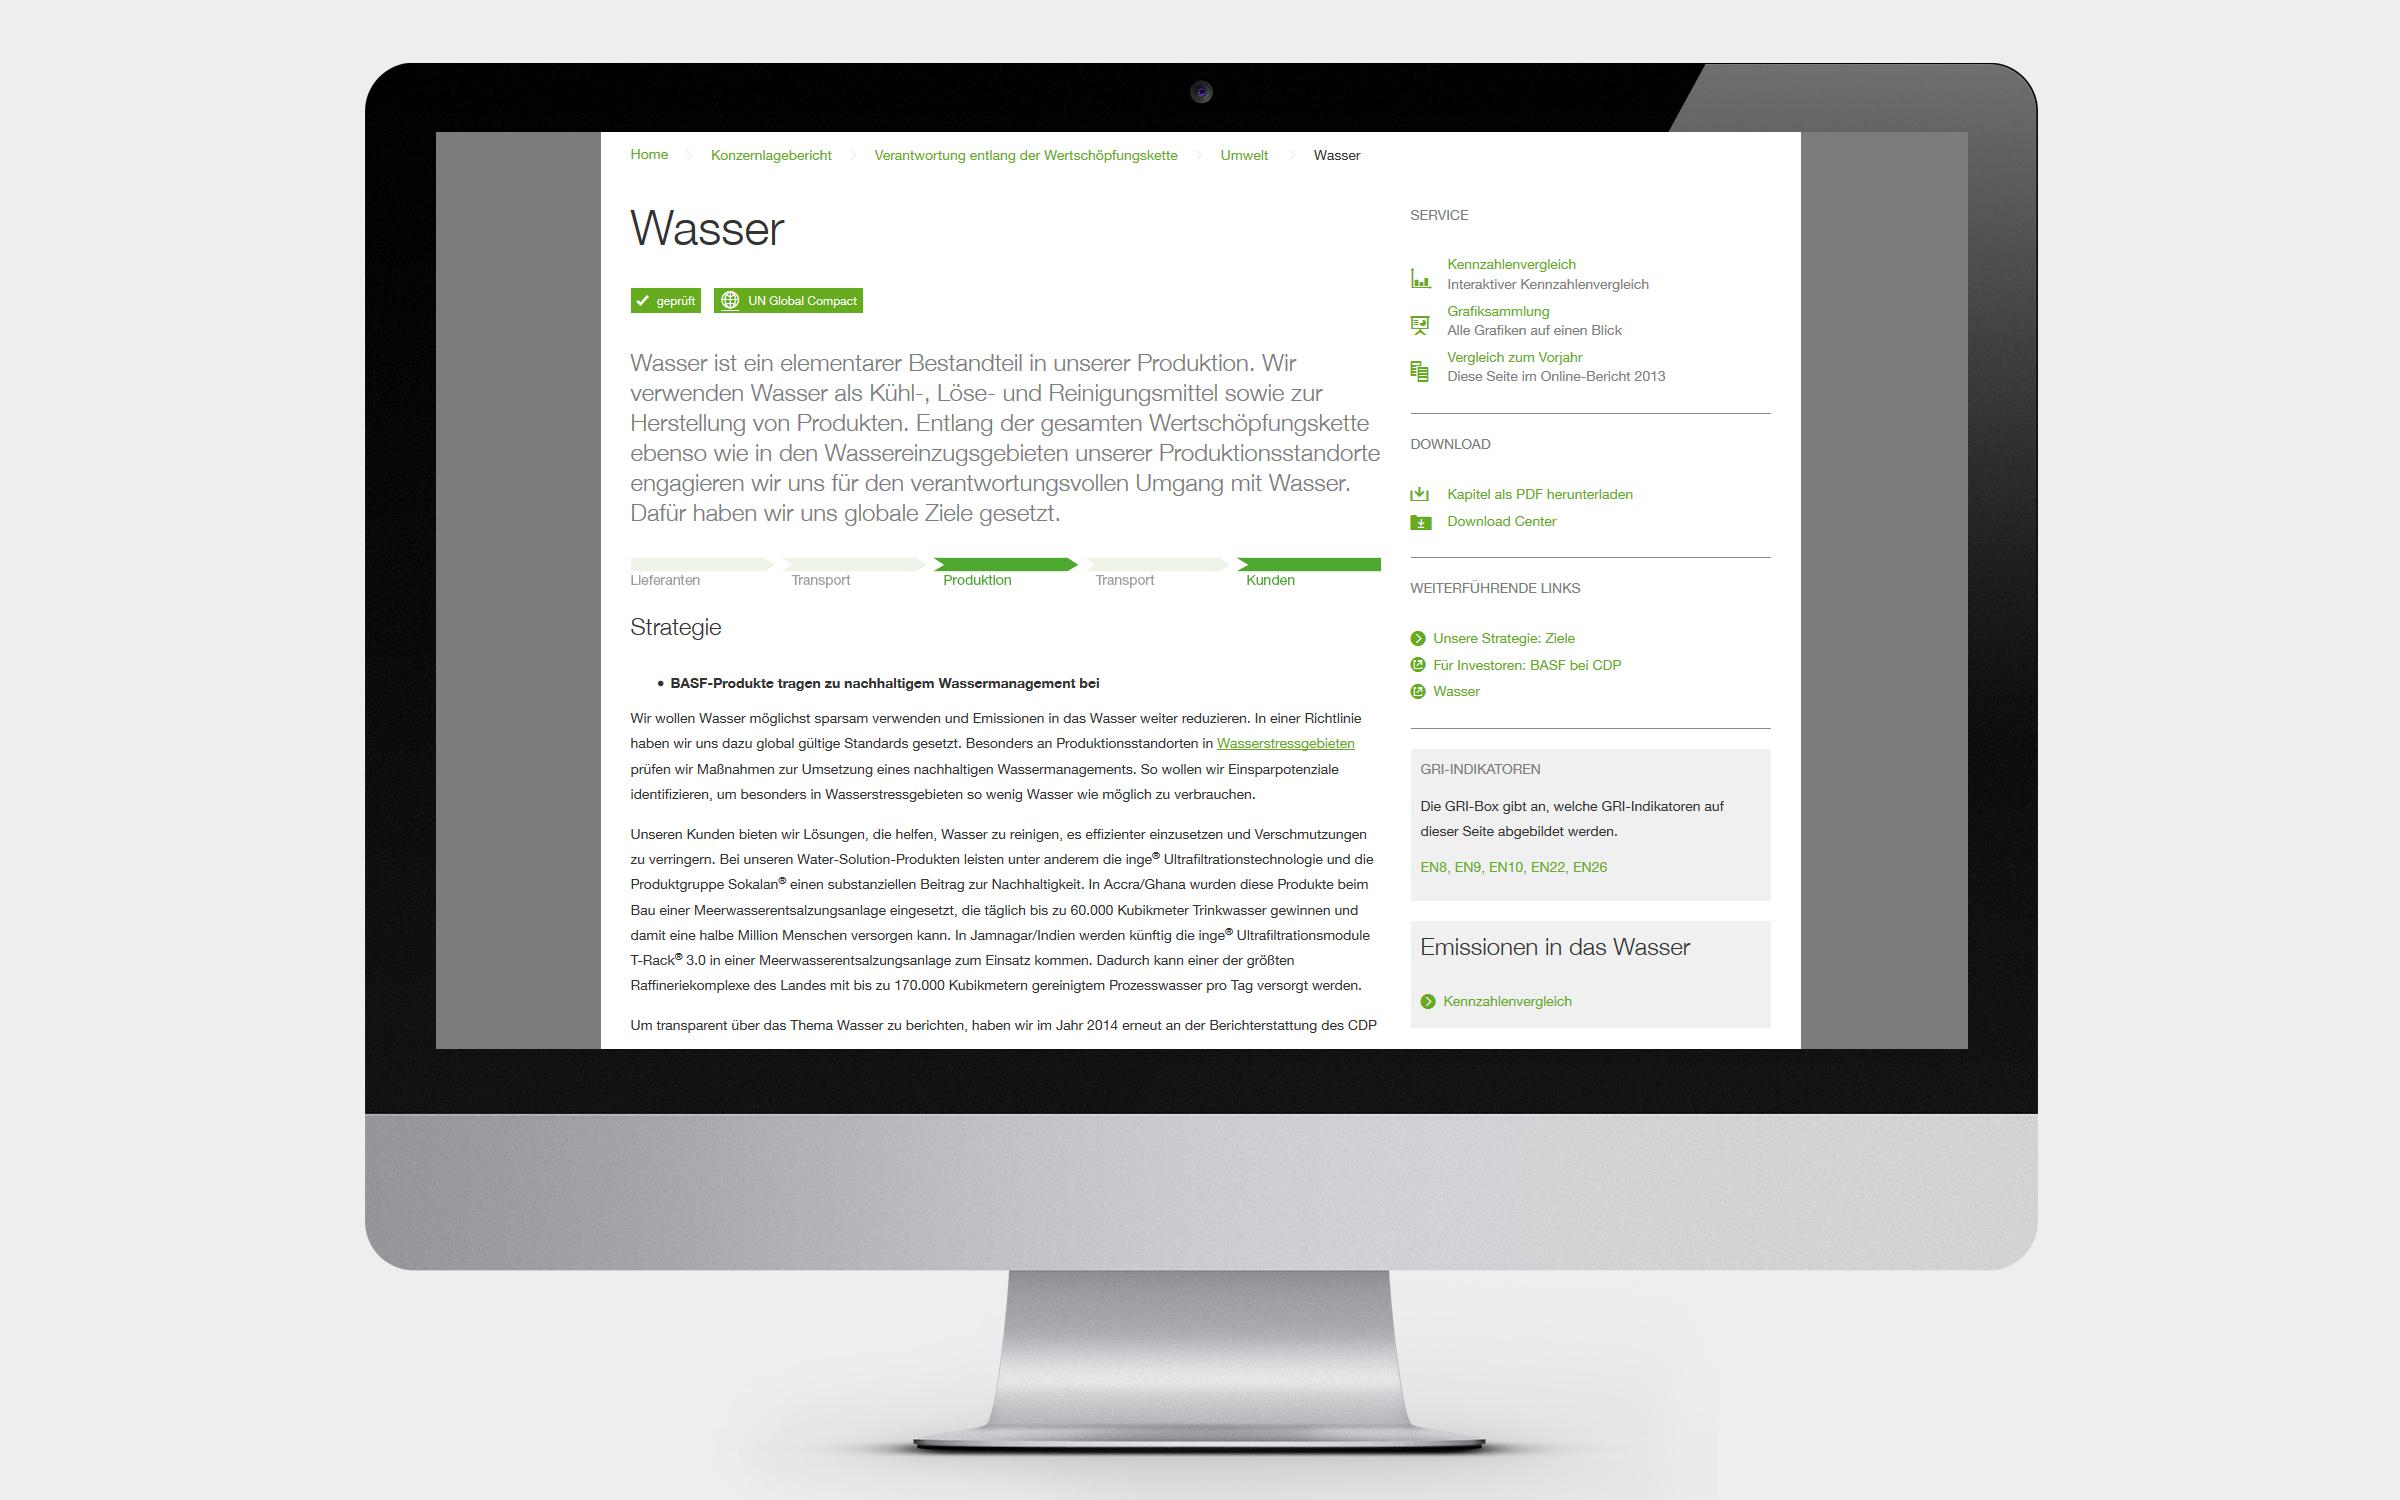 BASF Online-Bericht 2014